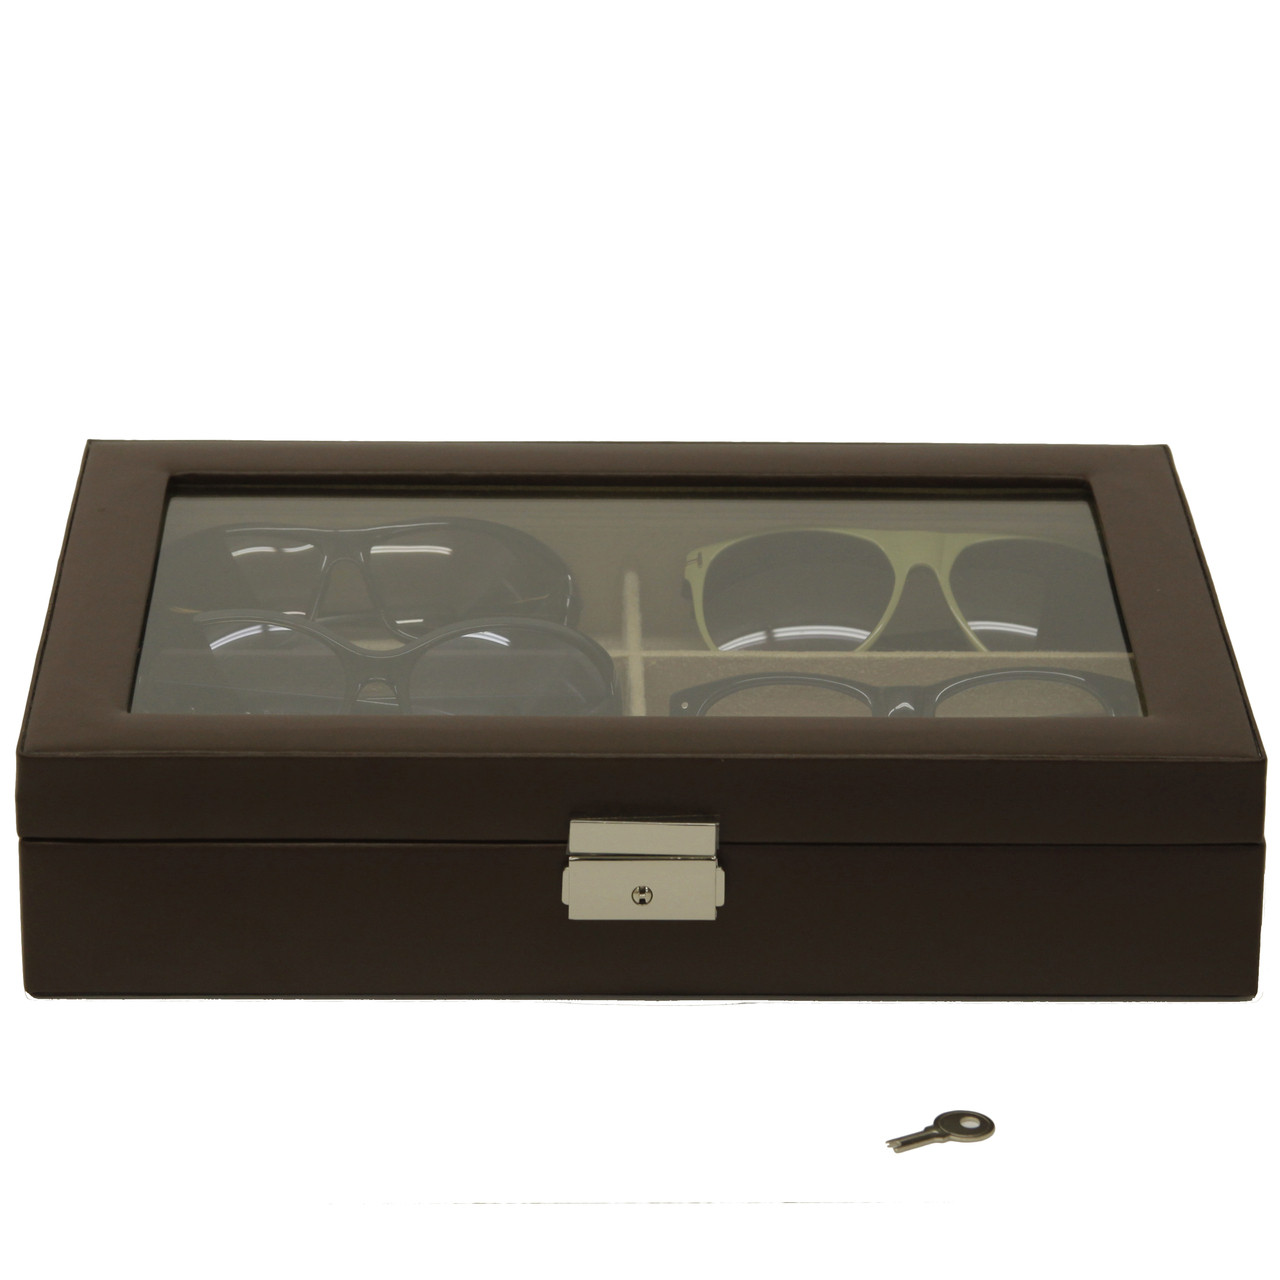 6 Eyeglasses Sunglasses Storage Case Leather Brown - Main